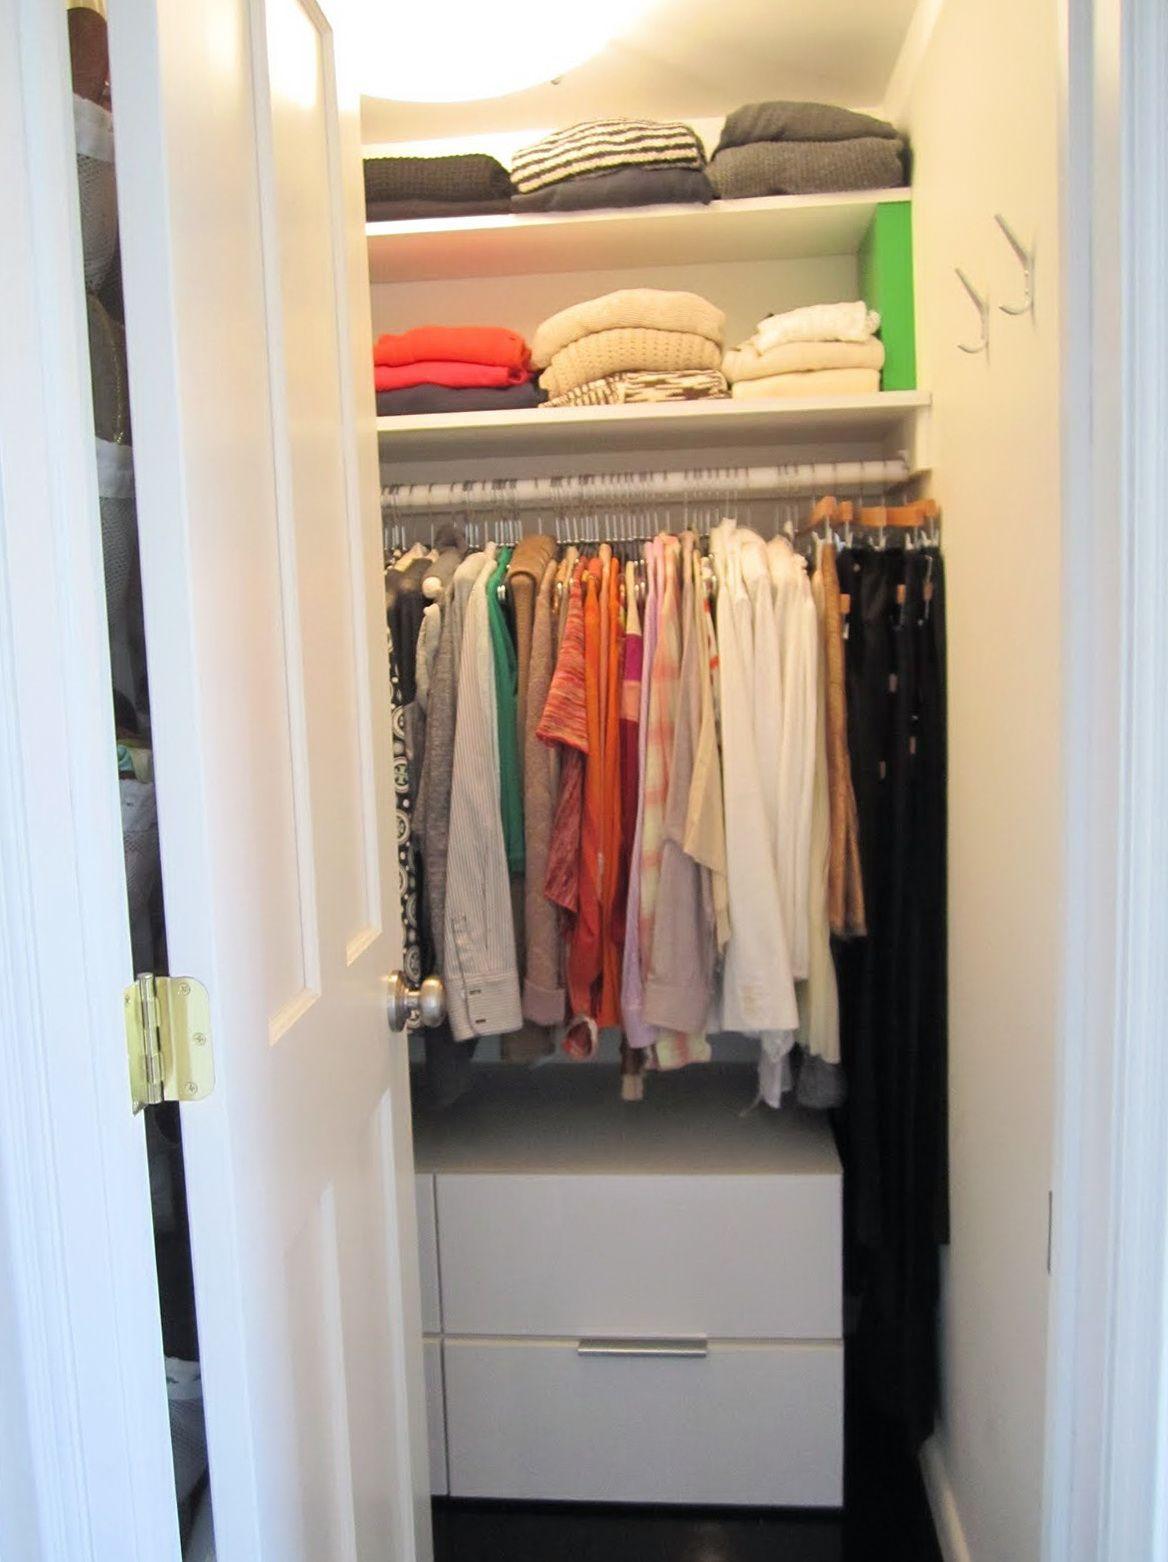 12 small walk in closet ideas and organizer designs small walk in closet ideas pinterest. Black Bedroom Furniture Sets. Home Design Ideas